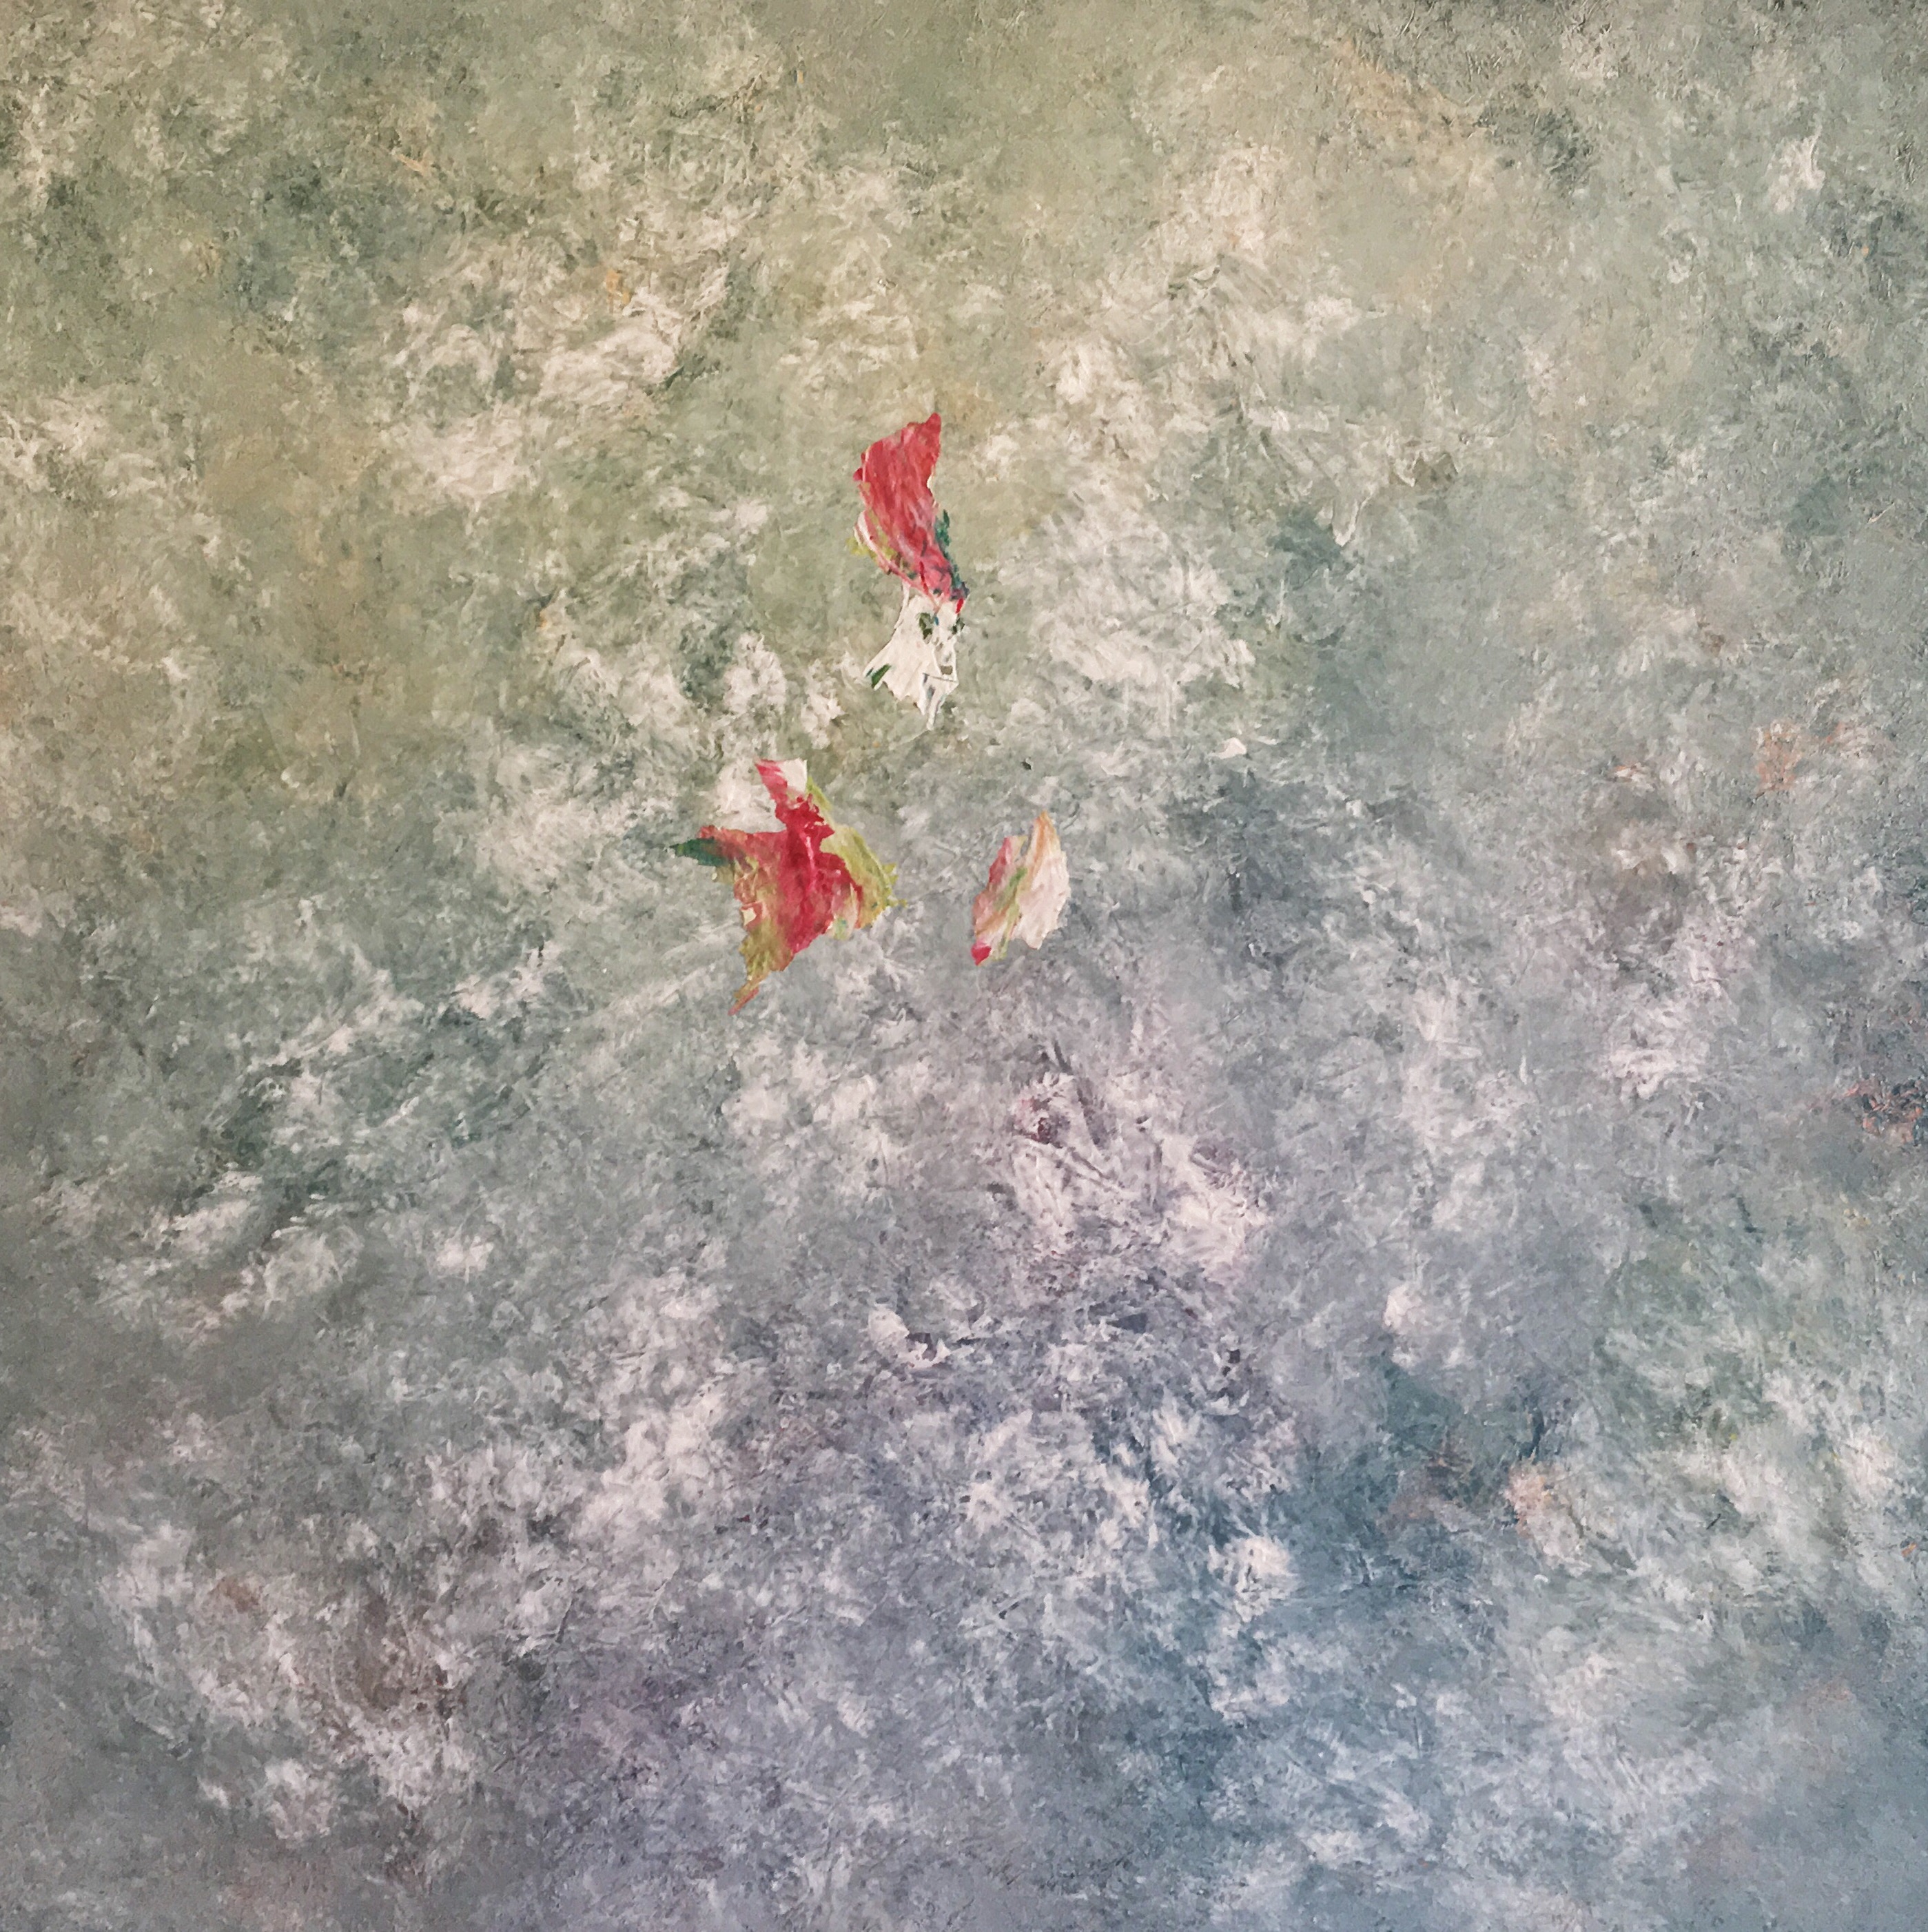 Marine Bonzom - Artiste Peintre Biarritz - Le Cœur Fou